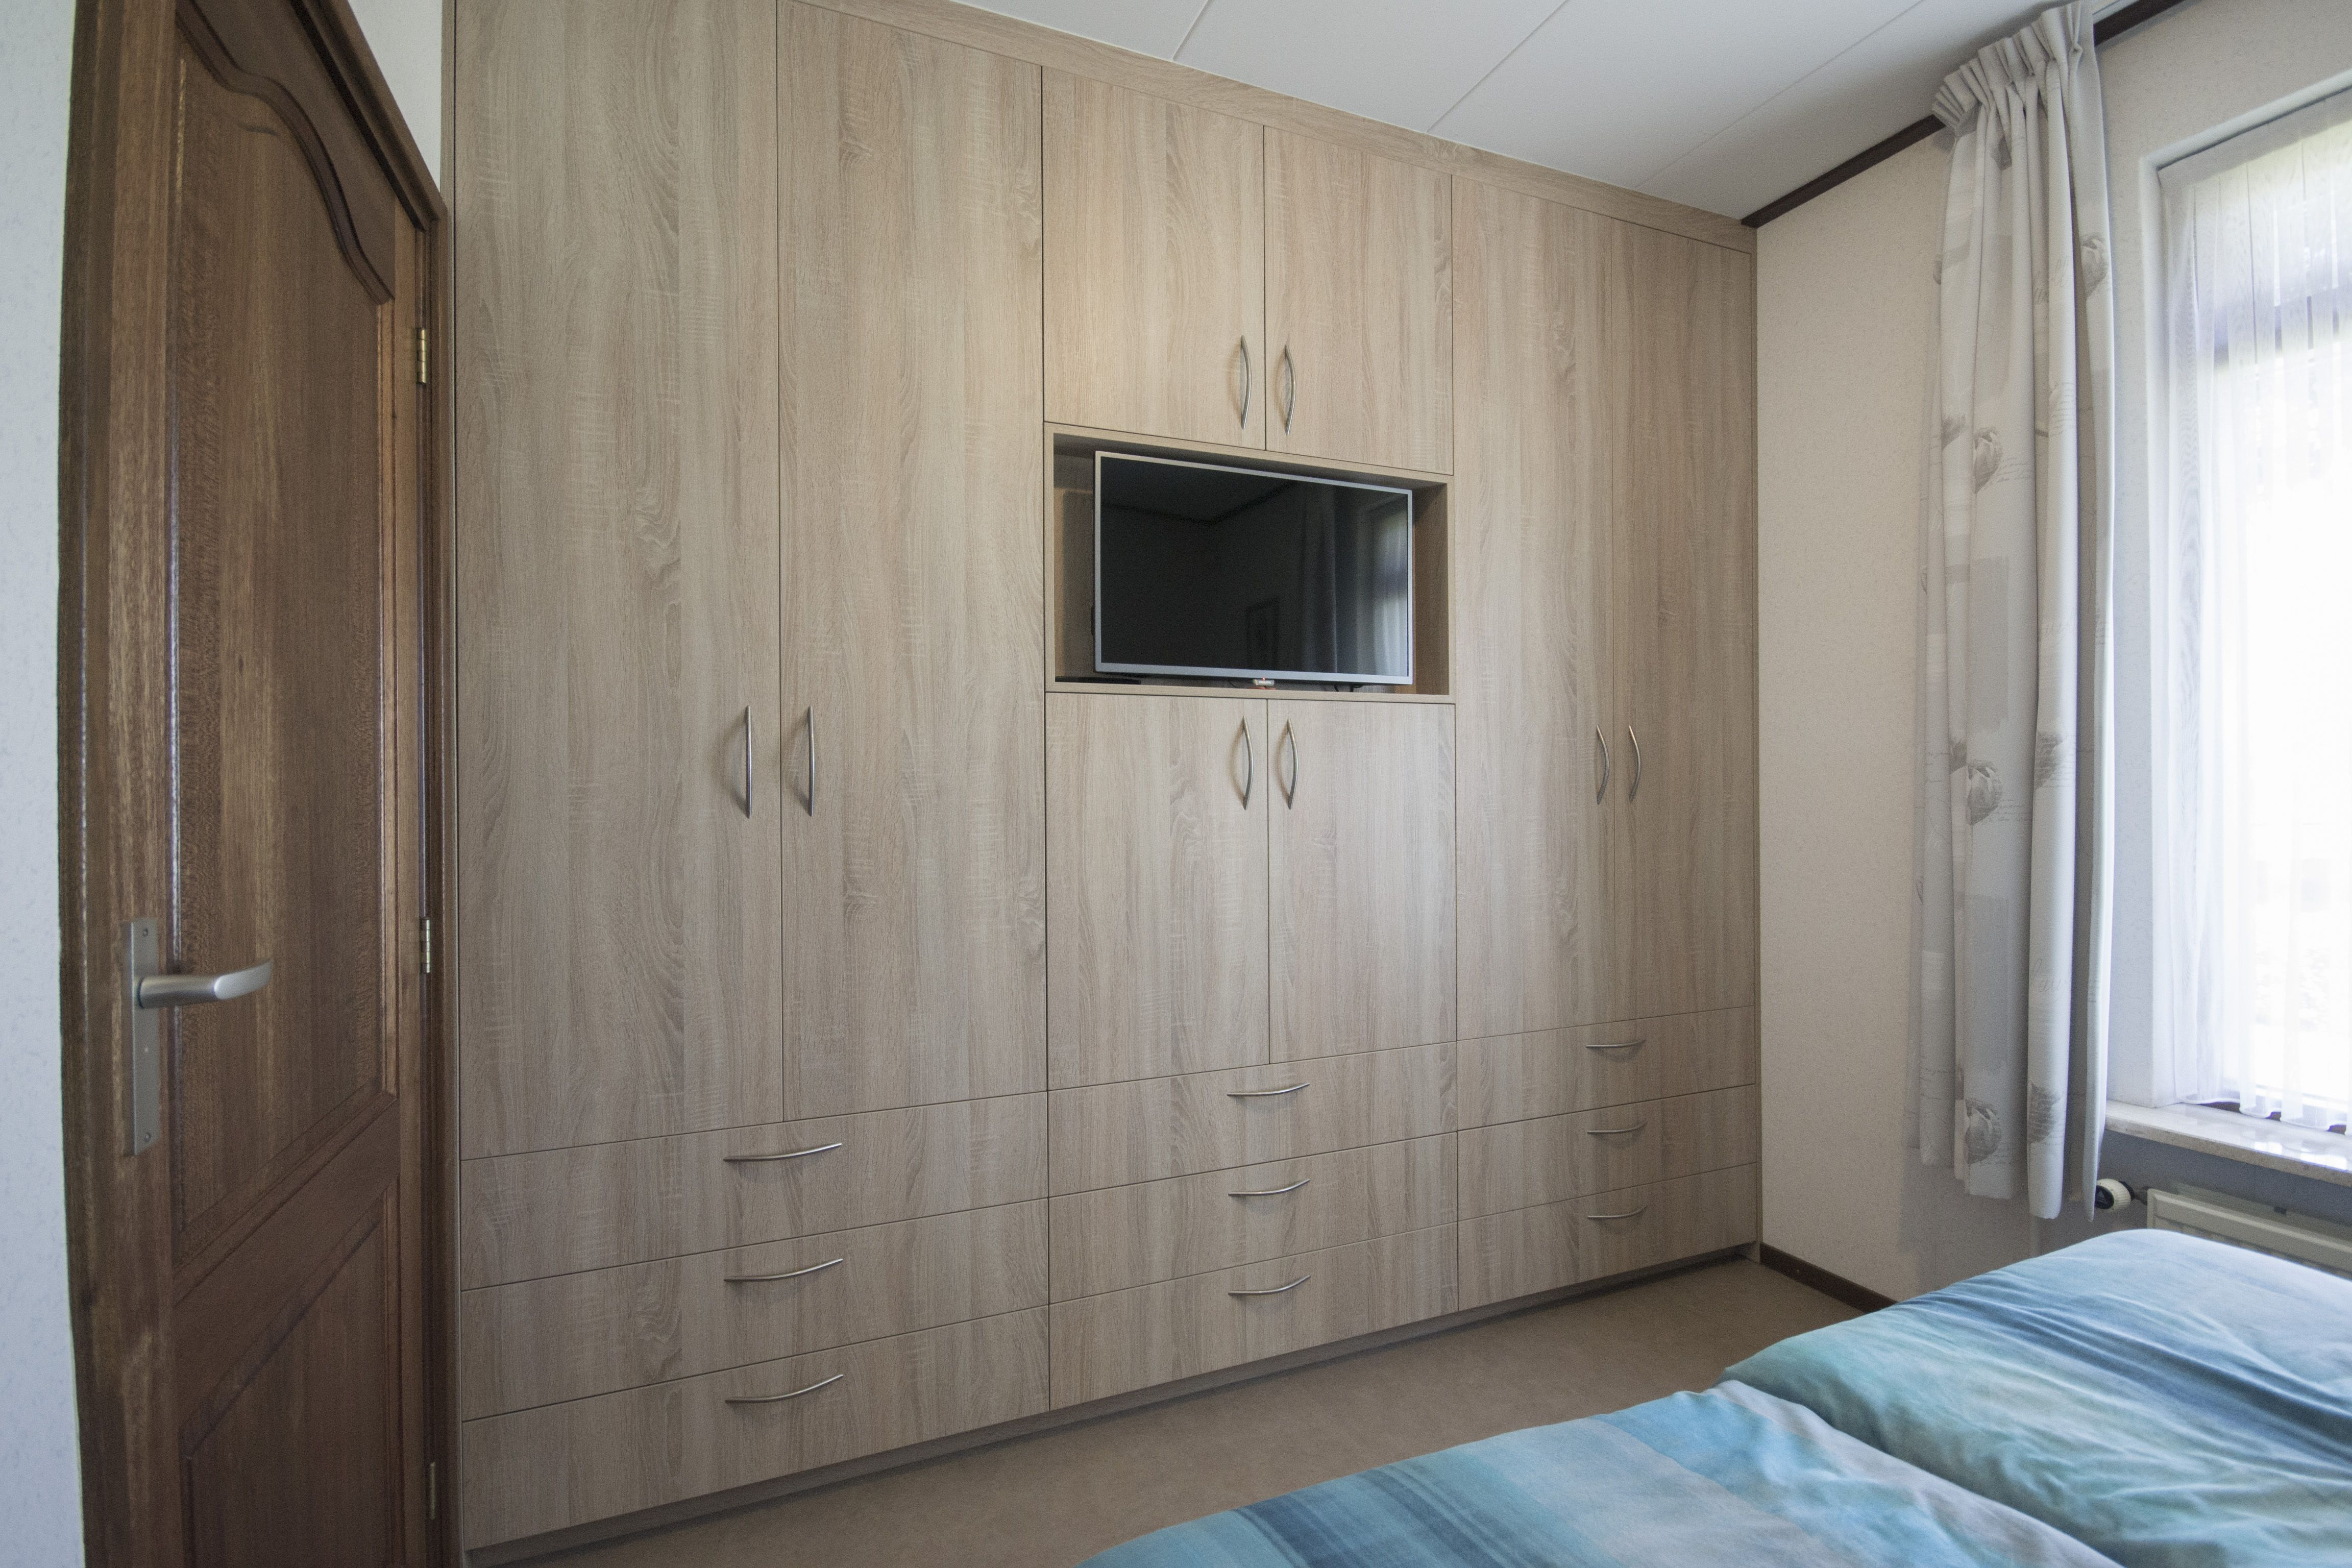 Slaapkamerkast Met Tv.Slaapkamerkast Uitgevoerd In Melamine Met Houtstructuur Voorzien